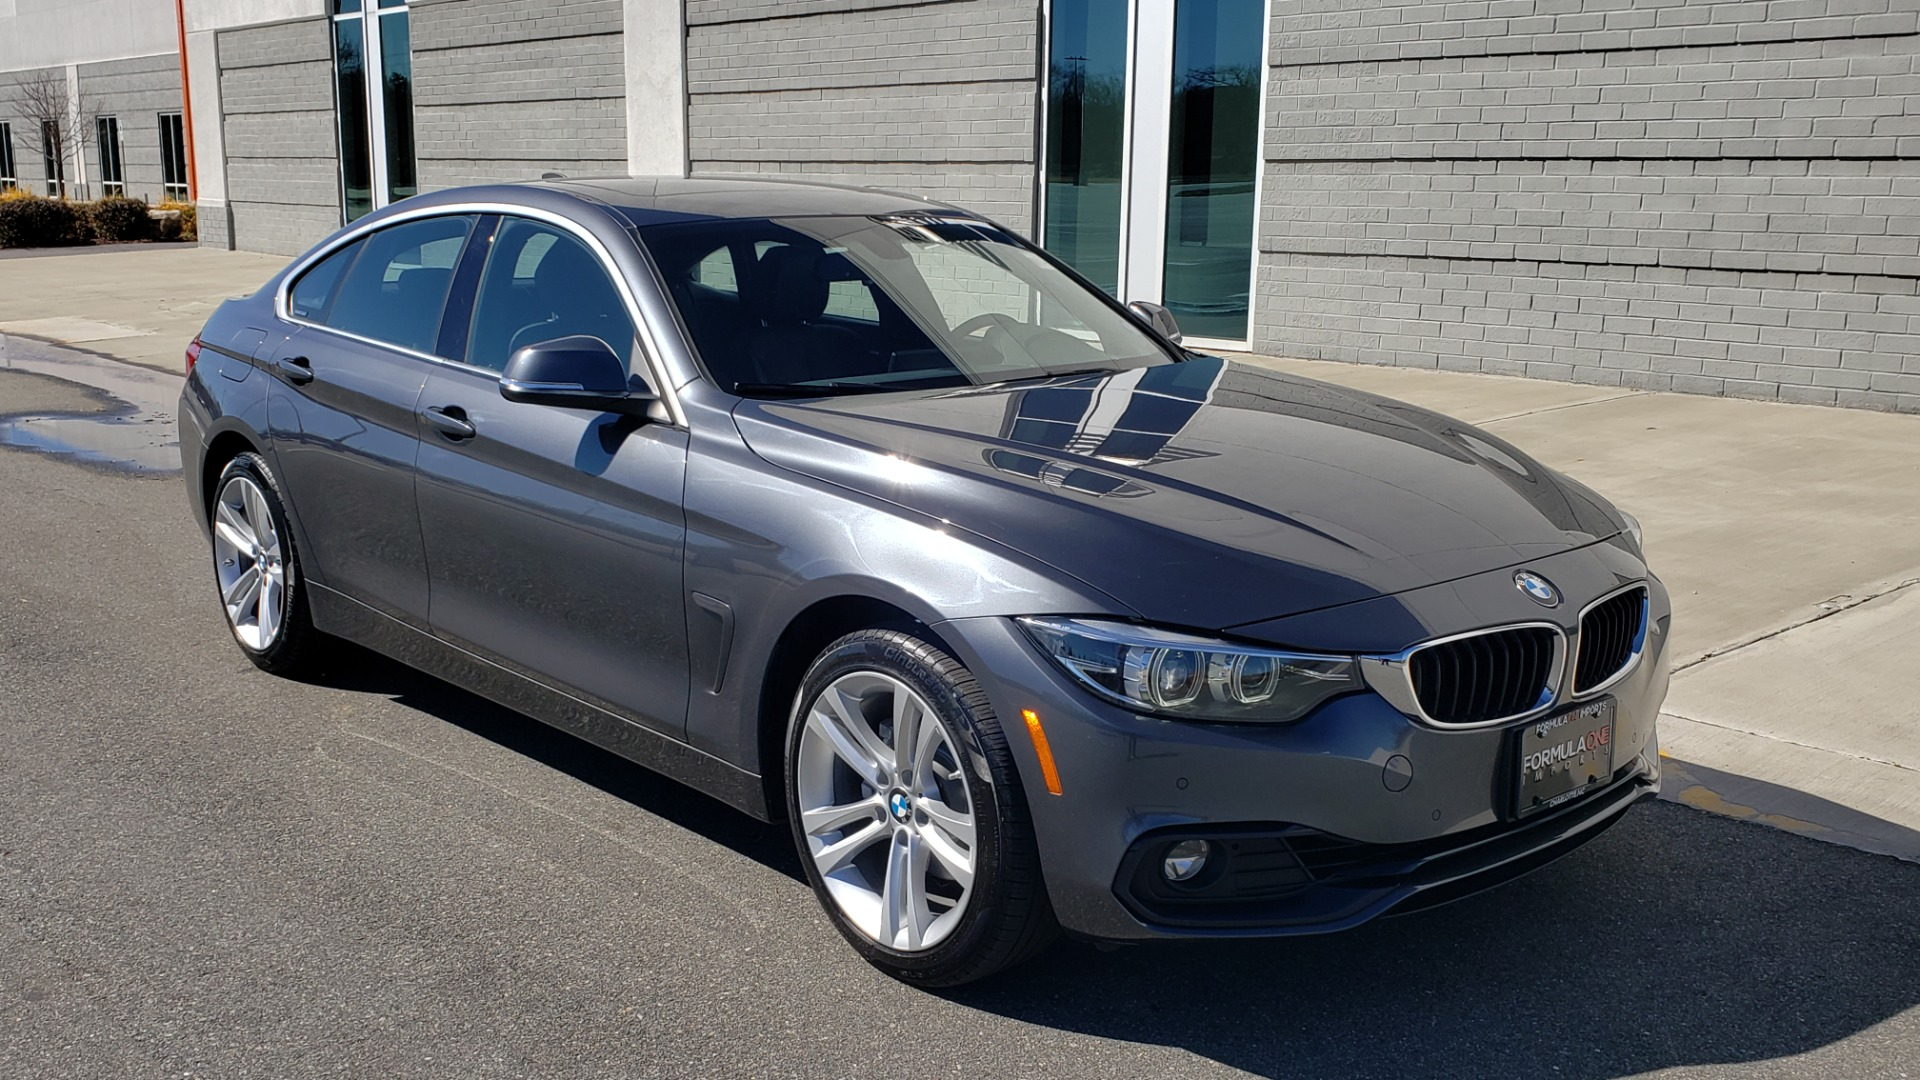 Used 2018 BMW 4 SERIES 430IXDRIVE / PREMIUM / NAV / SUNROOF / ESSENTIALS PKG for sale $29,495 at Formula Imports in Charlotte NC 28227 10